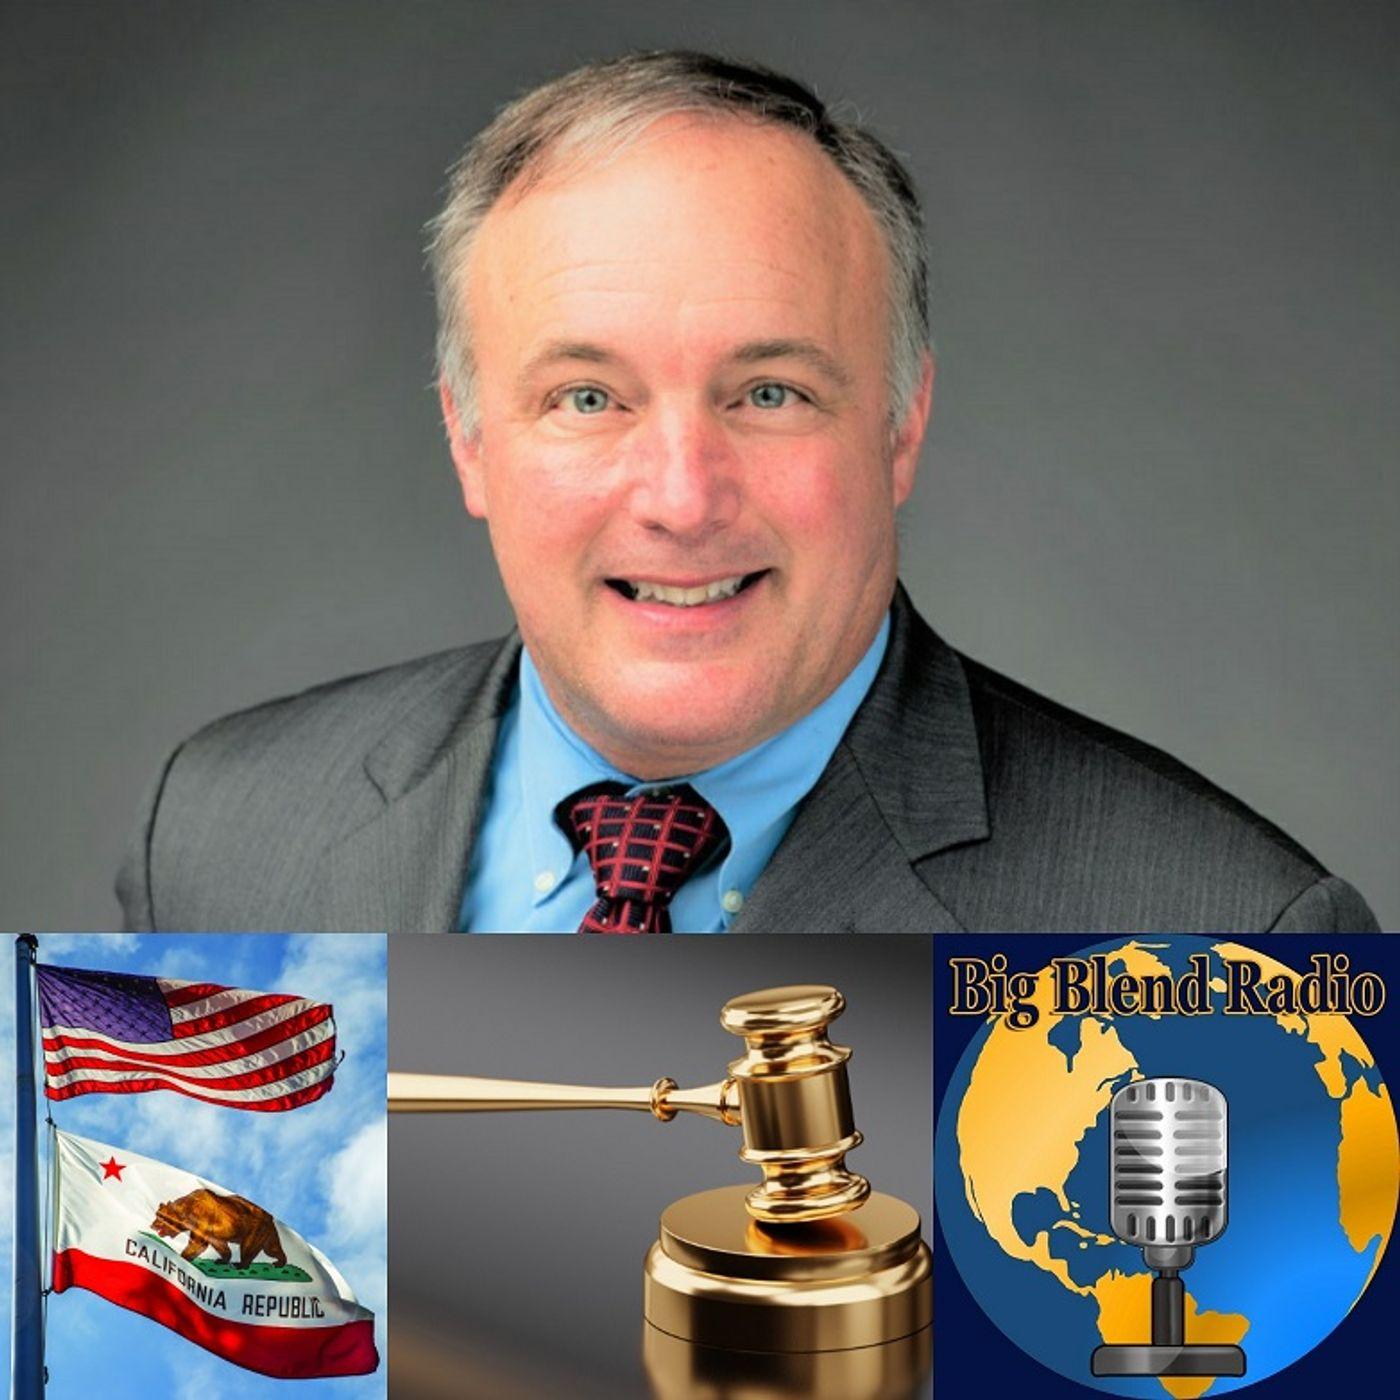 New Regulations for California Small Business - Attorney Ward Heinrichs on Big Blend Radio